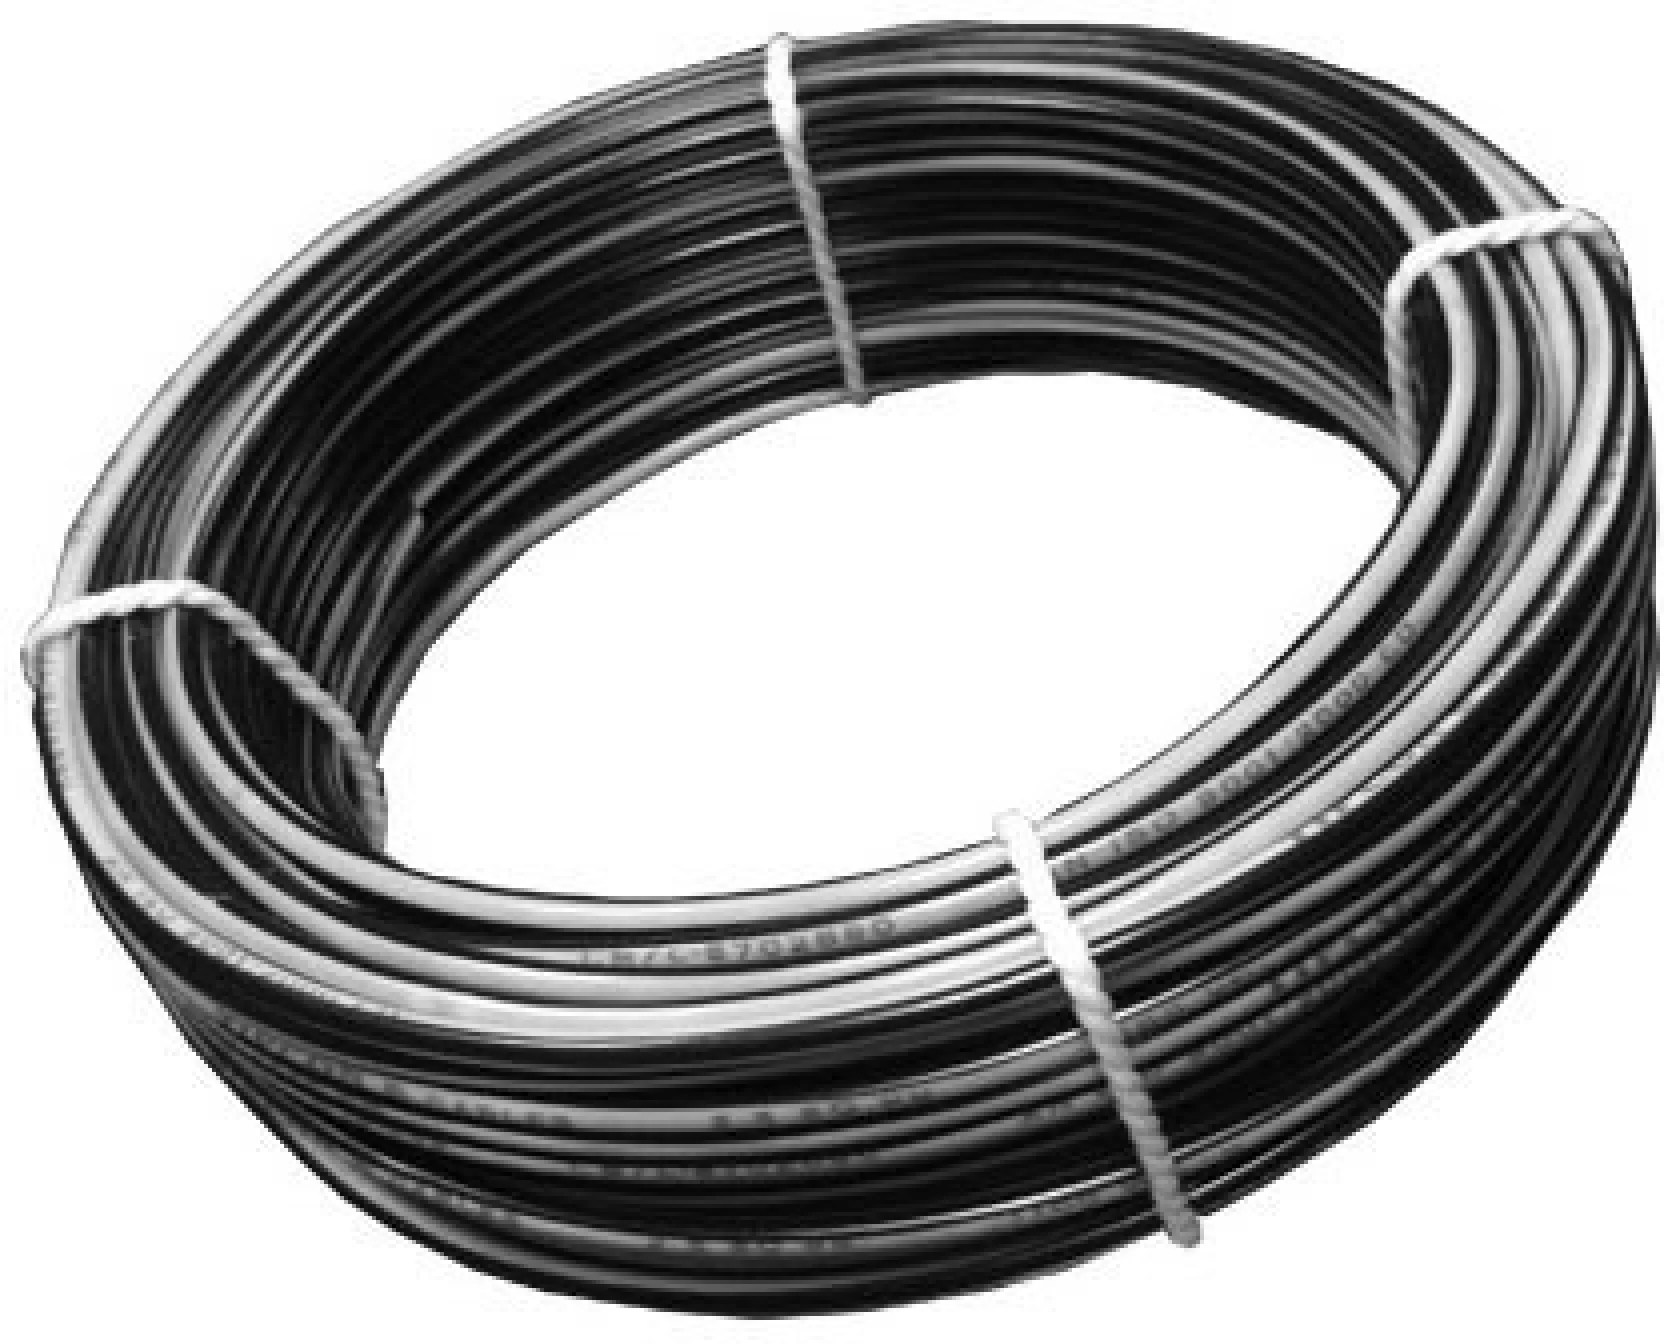 medium resolution of tipcon fr 2 5 sq mm black 30 m wire black